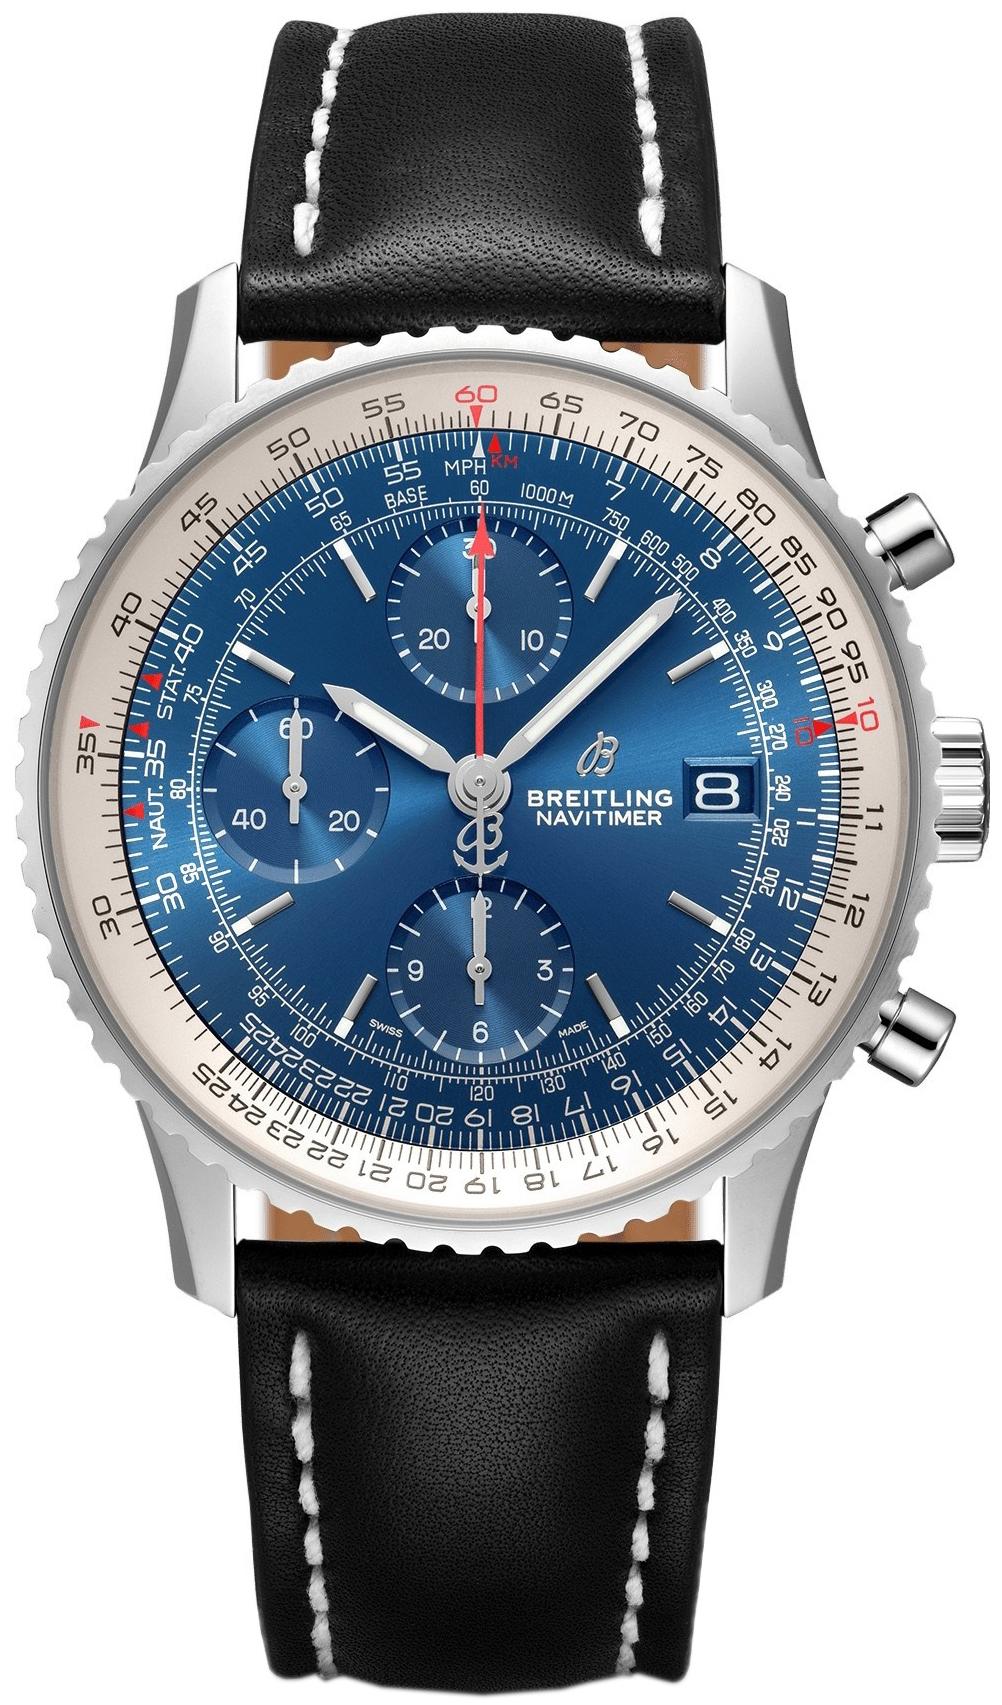 Breitling Navitimer 1 Chronograph 41 Herreklokke A13324121C1X2 - Breitling